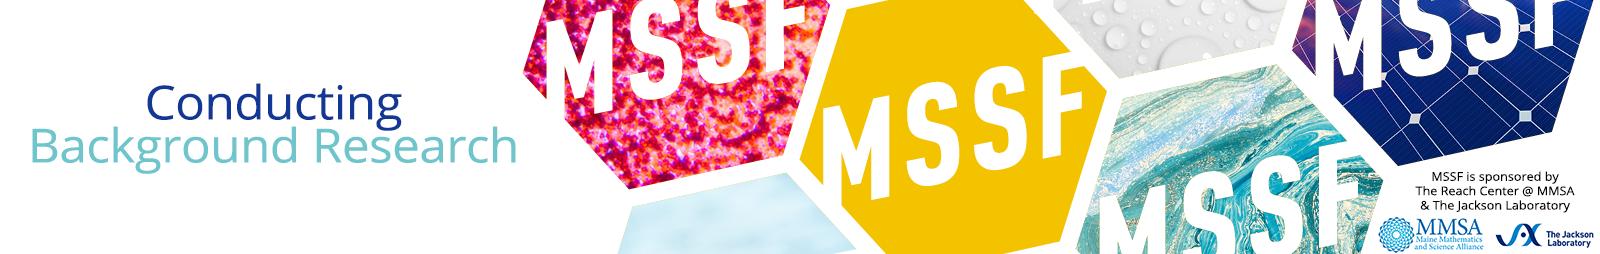 MMSA Courses